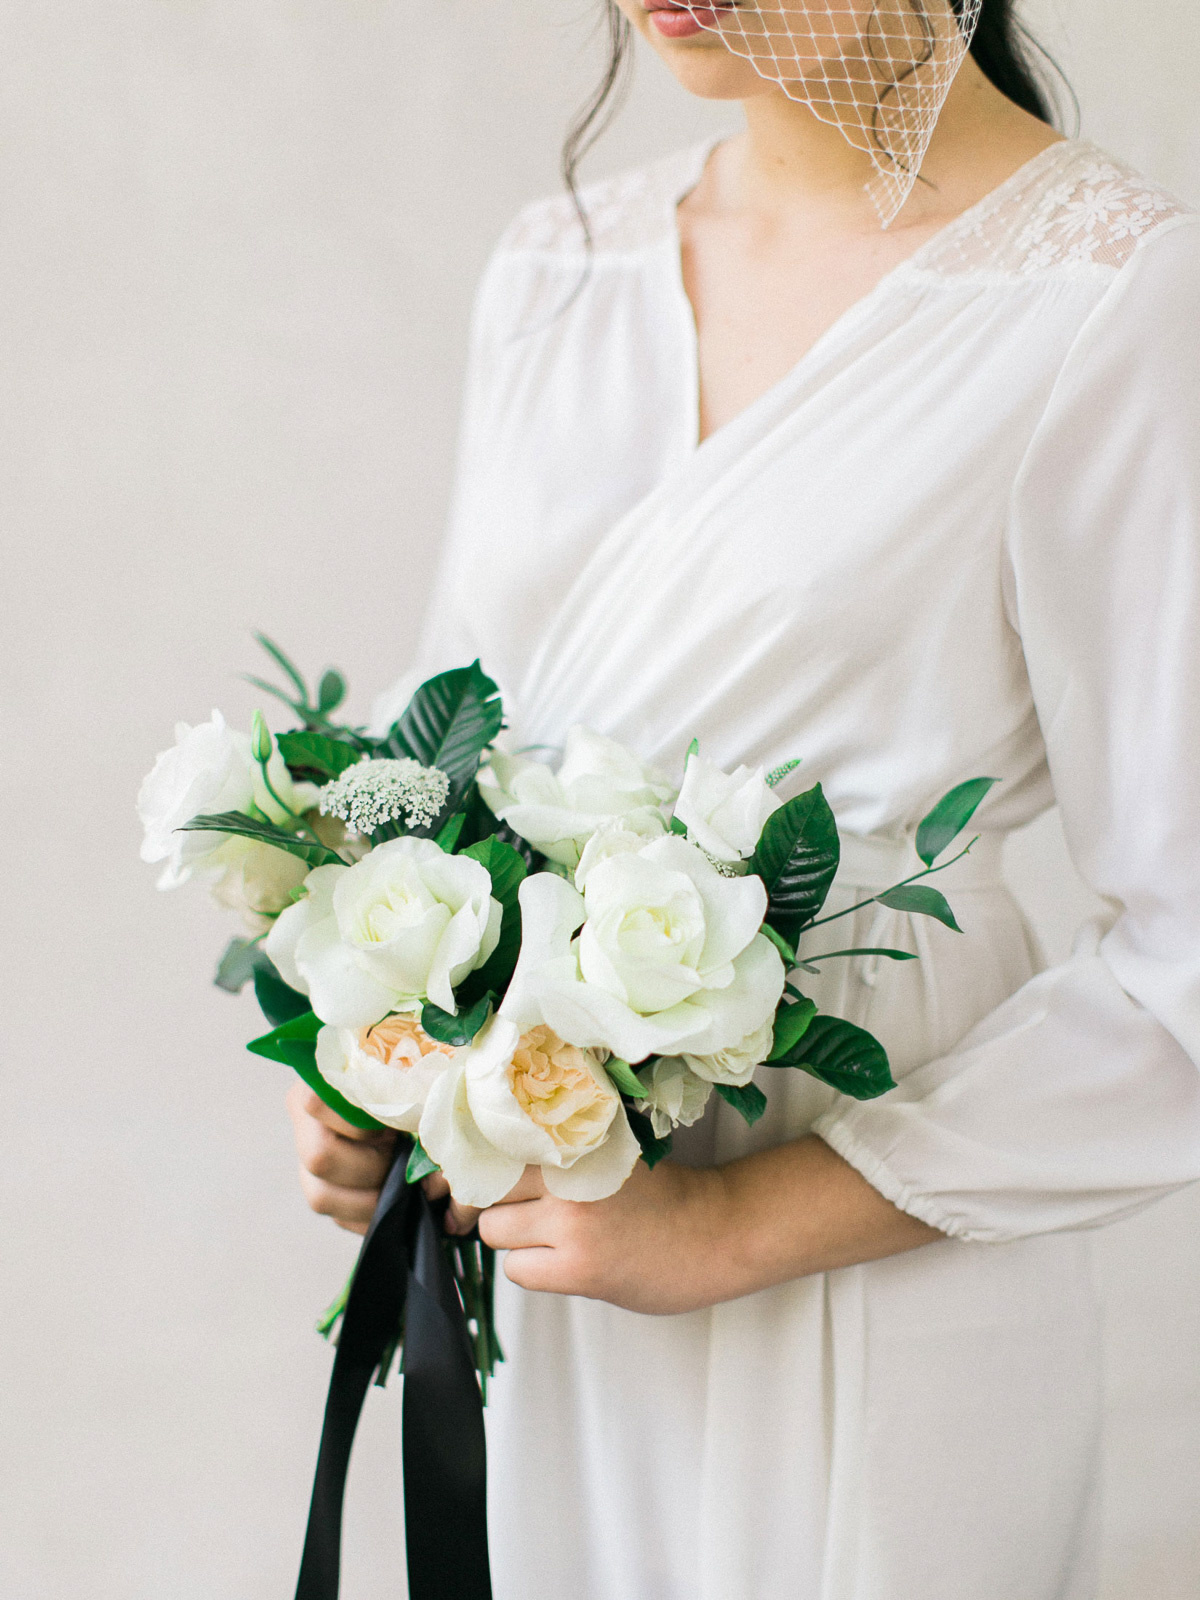 kurtz-orpia-photography-vineyard-bride-swish-list-dundurn-castle-dundas-wedding-editorial-17.jpg